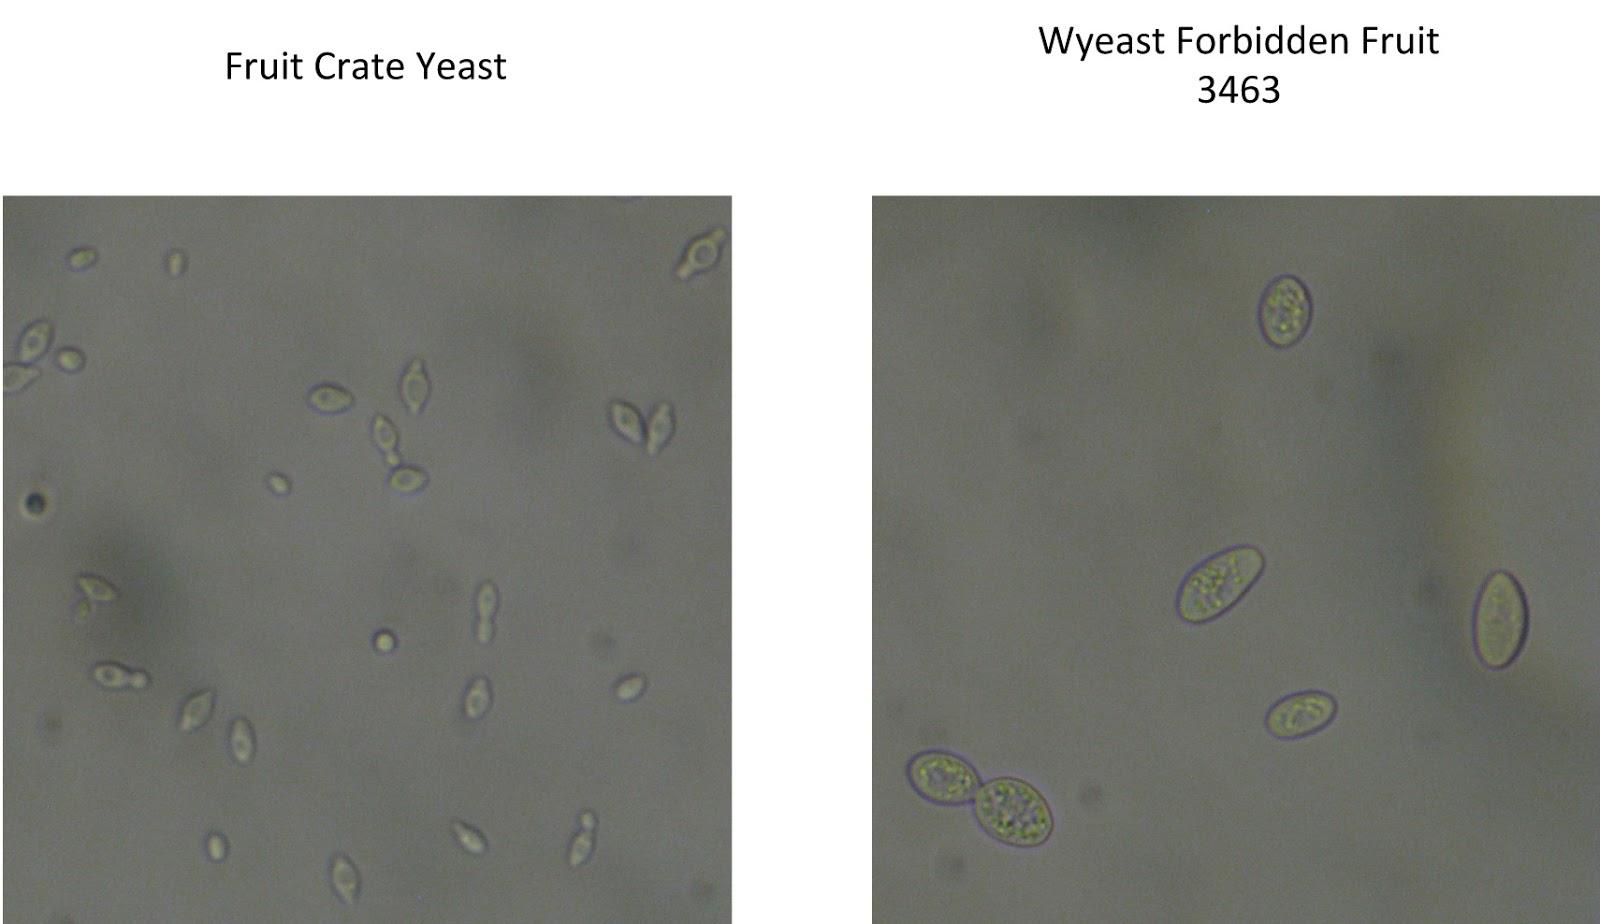 Another Wild Yeast Identification Test